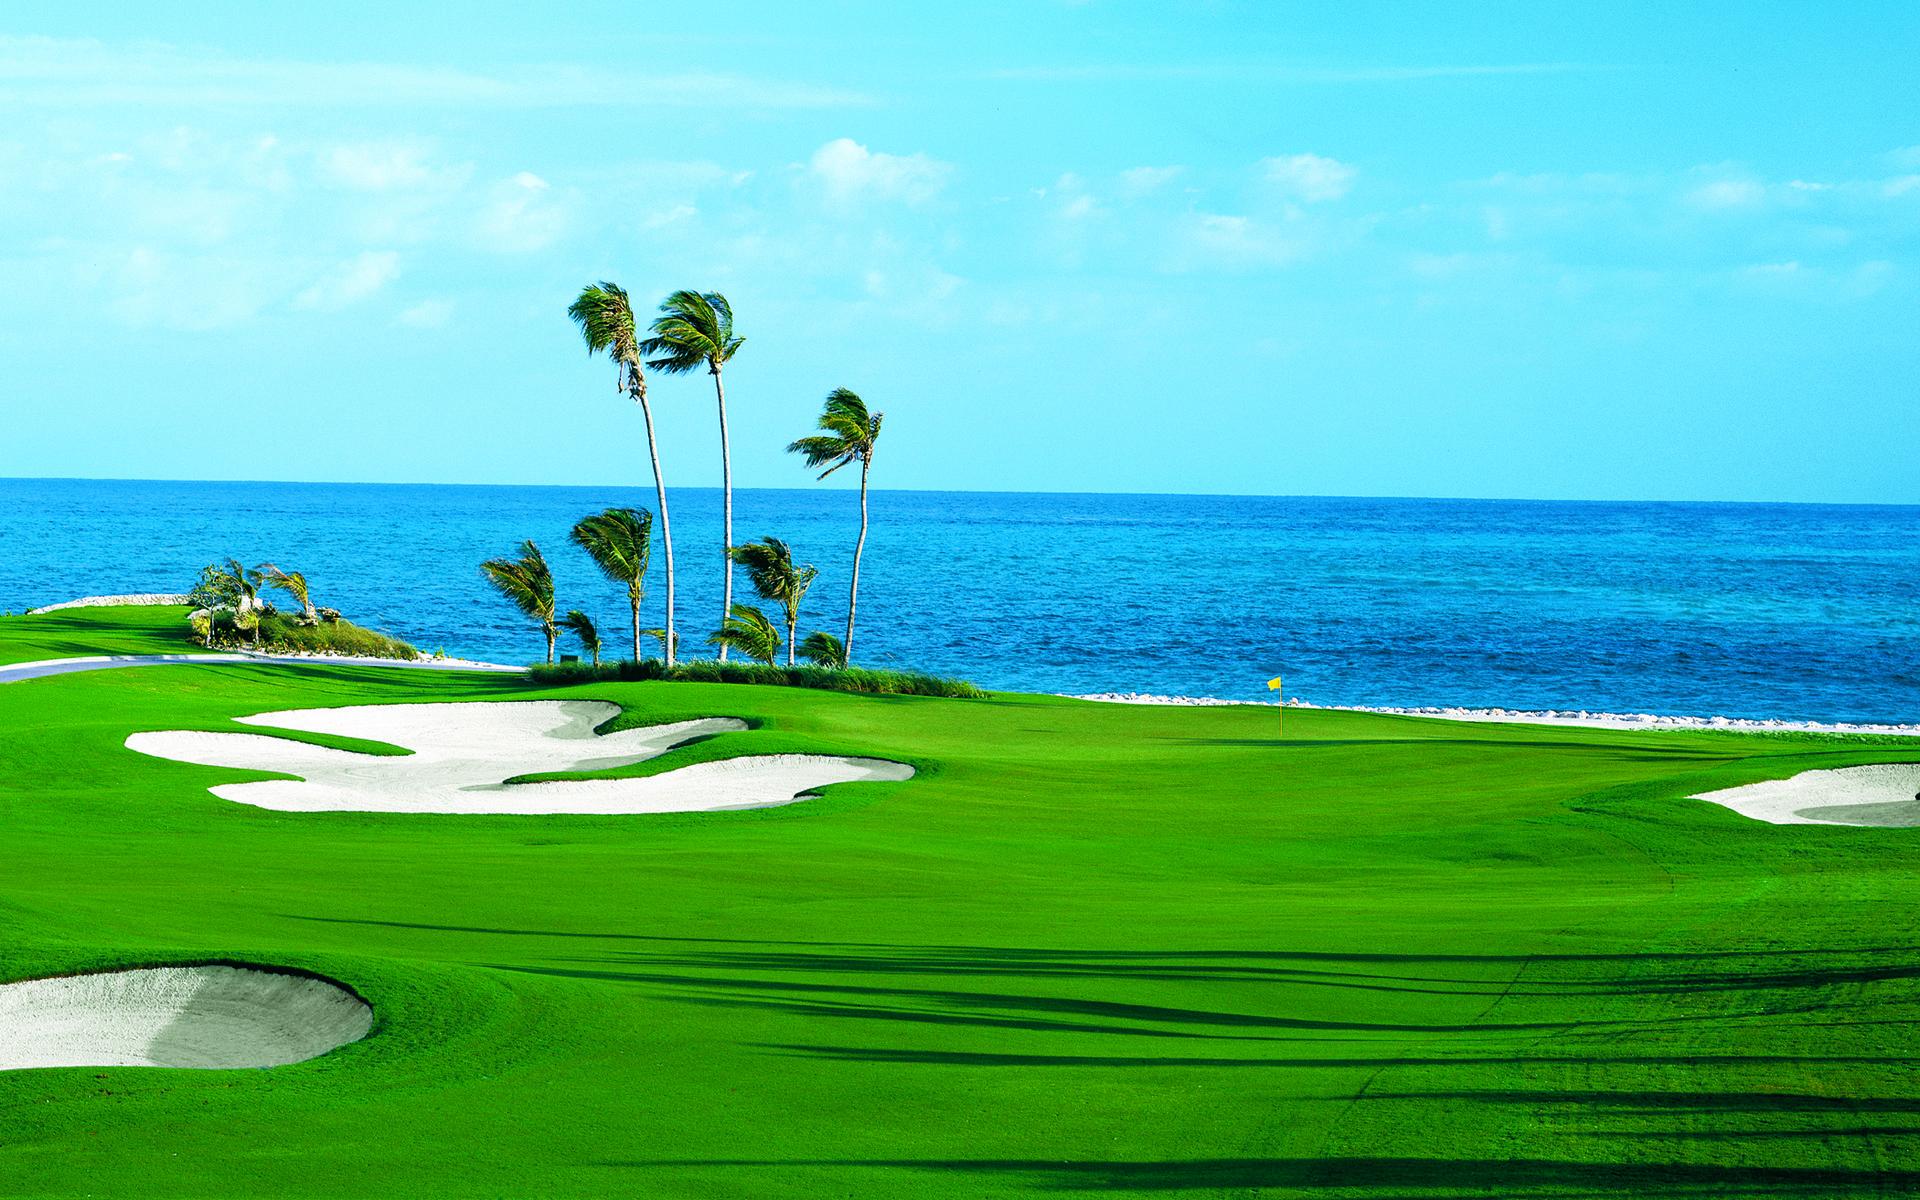 Golf Course Images Wallpaper Desktop Backgrounds Golf